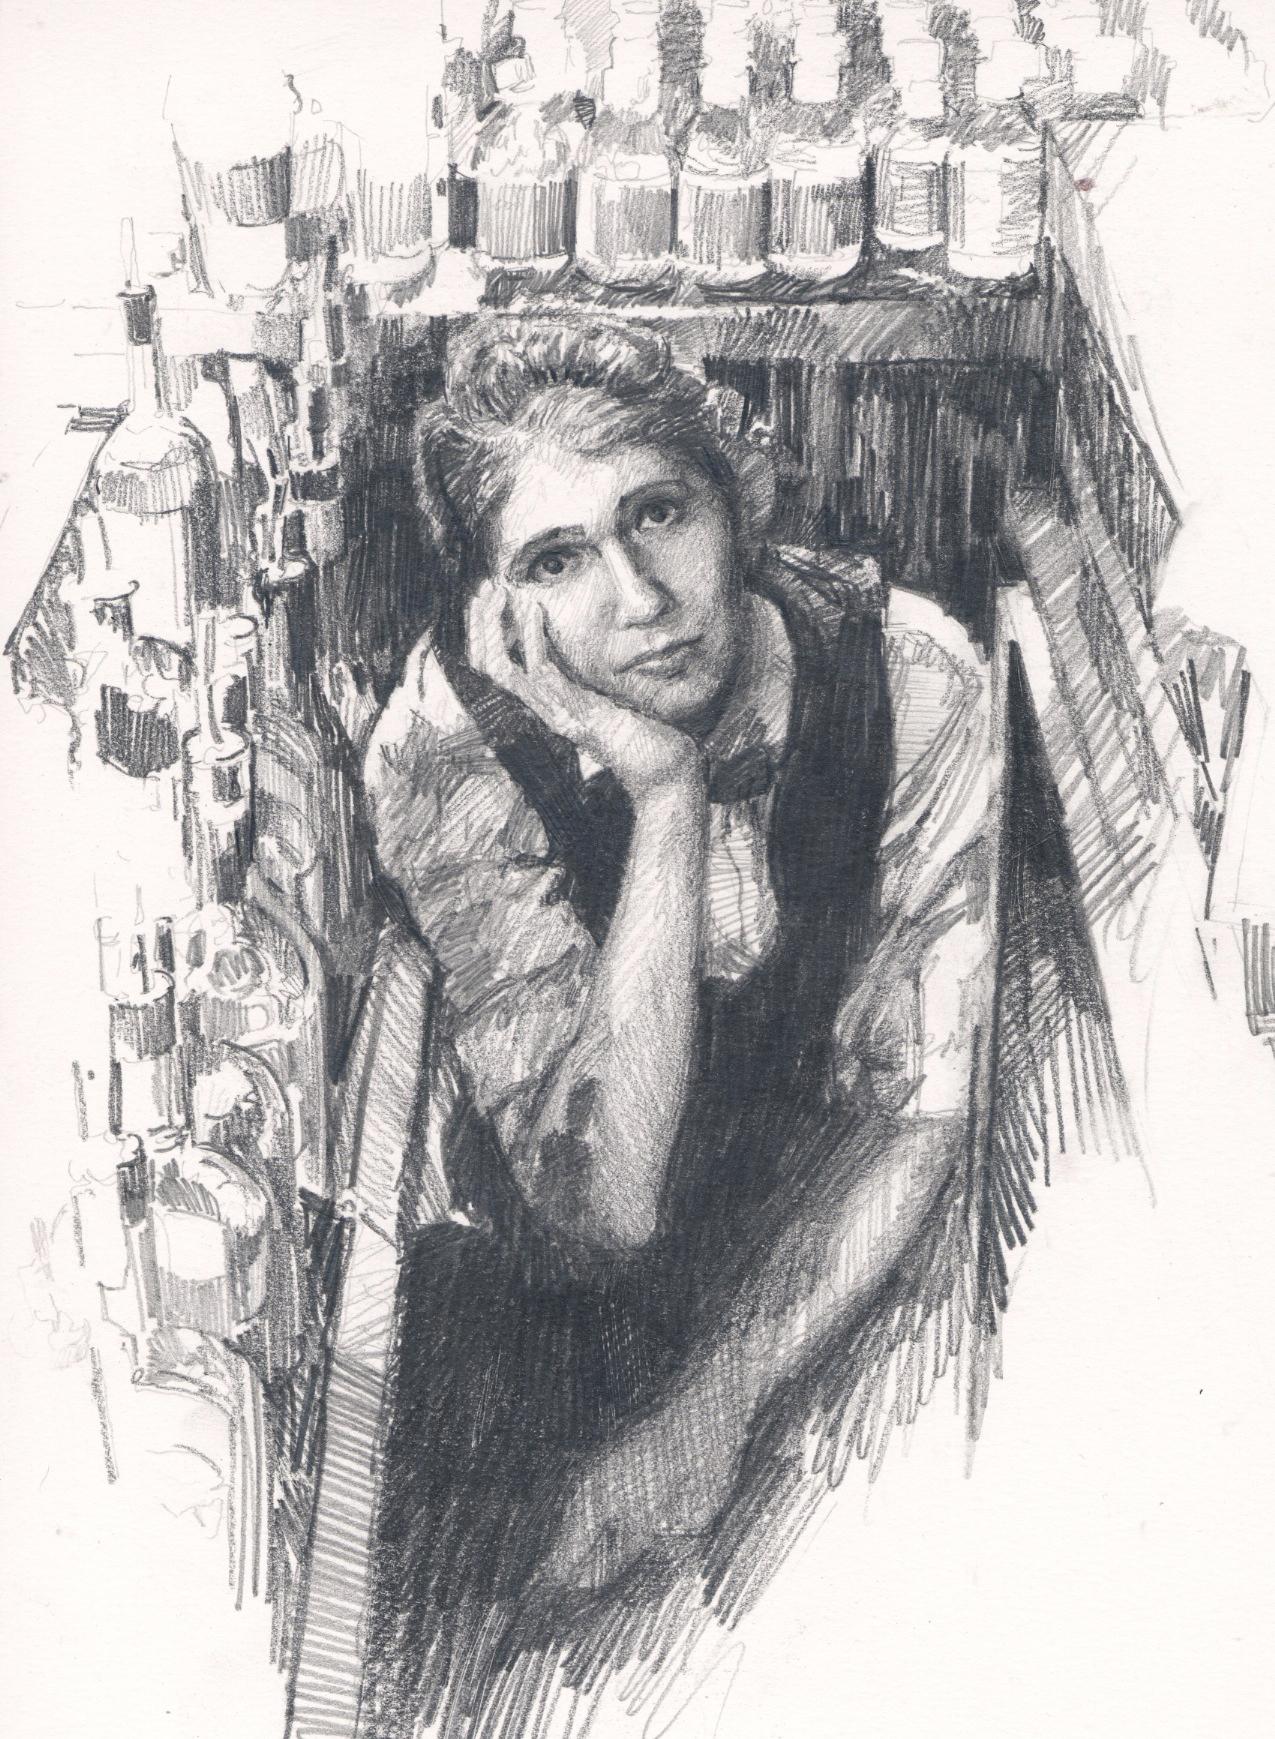 Drawing by Stephen Gardner